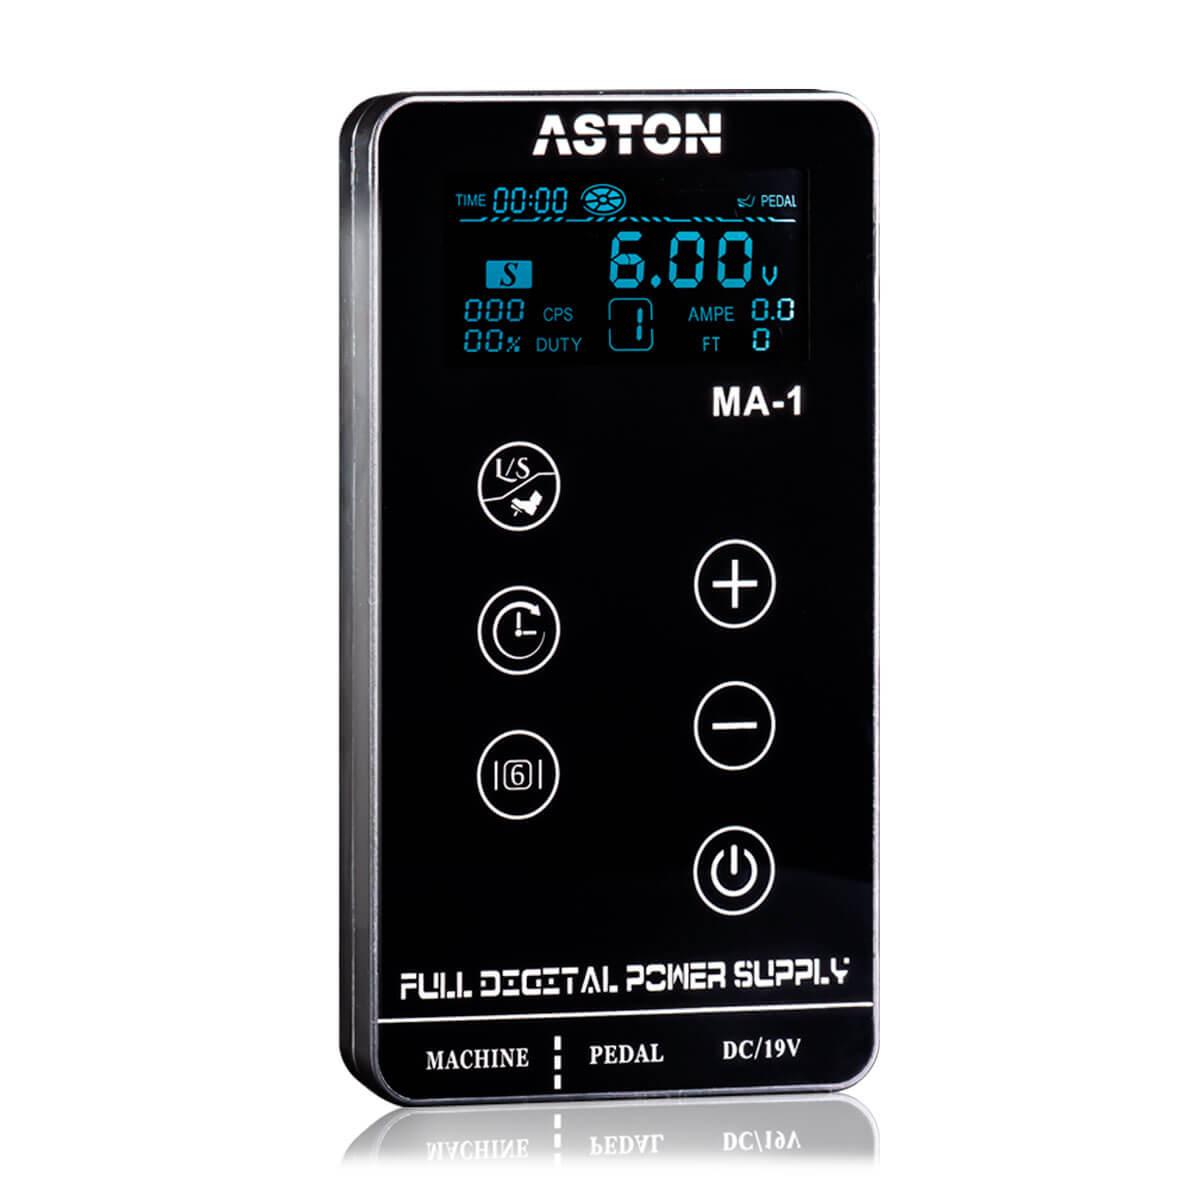 Kit Aston Pen Create Dourado + Fonte Aston Ma-1